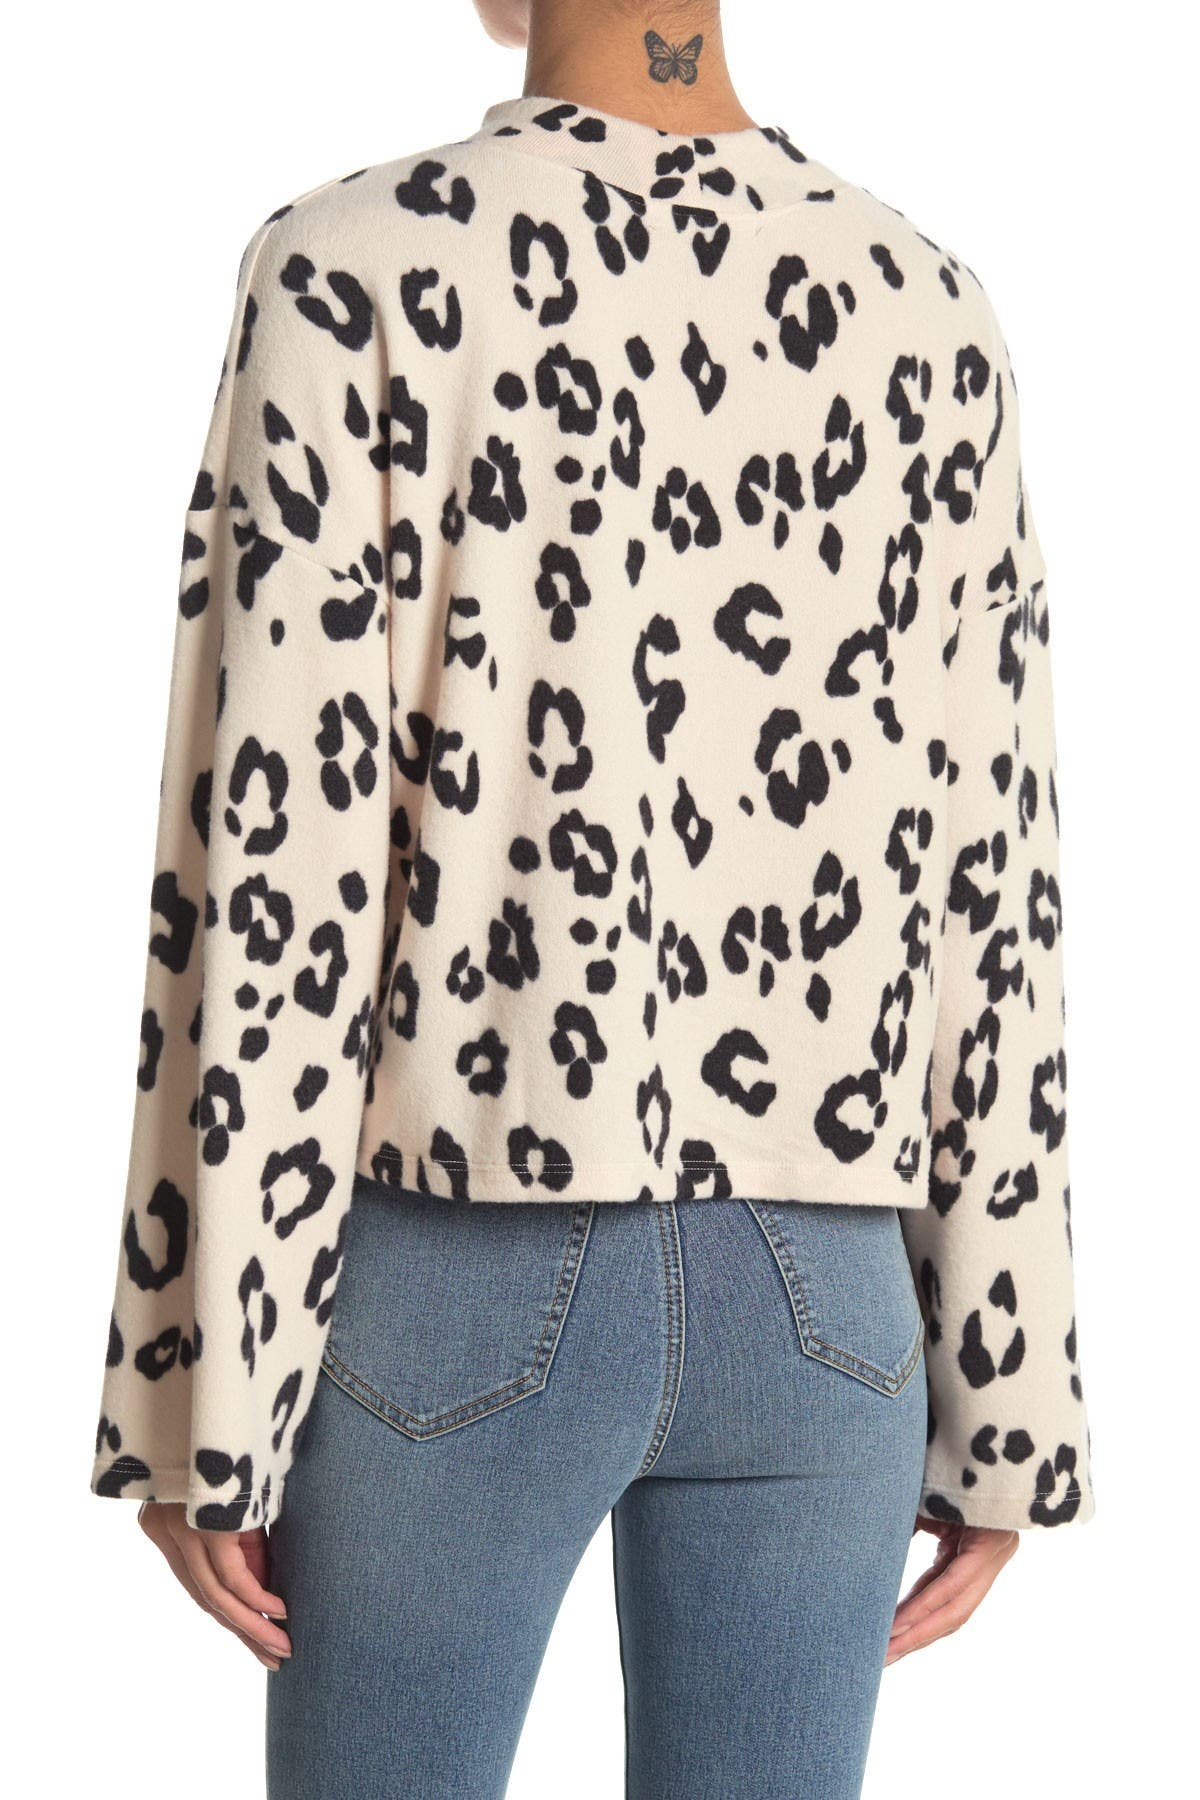 Image of GOOD LUCK GEM Bell Sleeve Fleece Leopard Print Sweatshirt